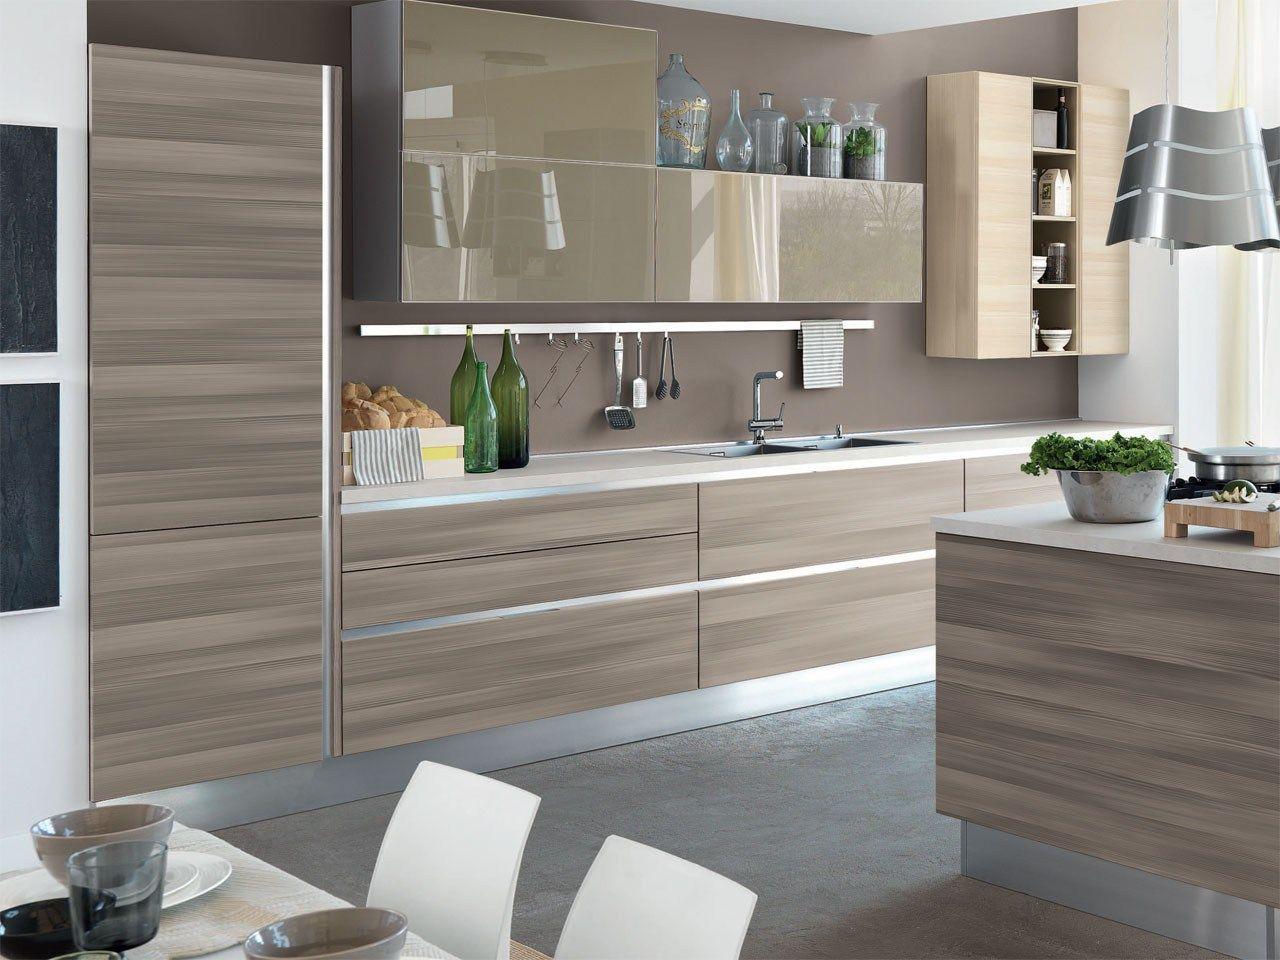 Lube essenza cerca con google cocinas pinterest for Google muebles de cocina